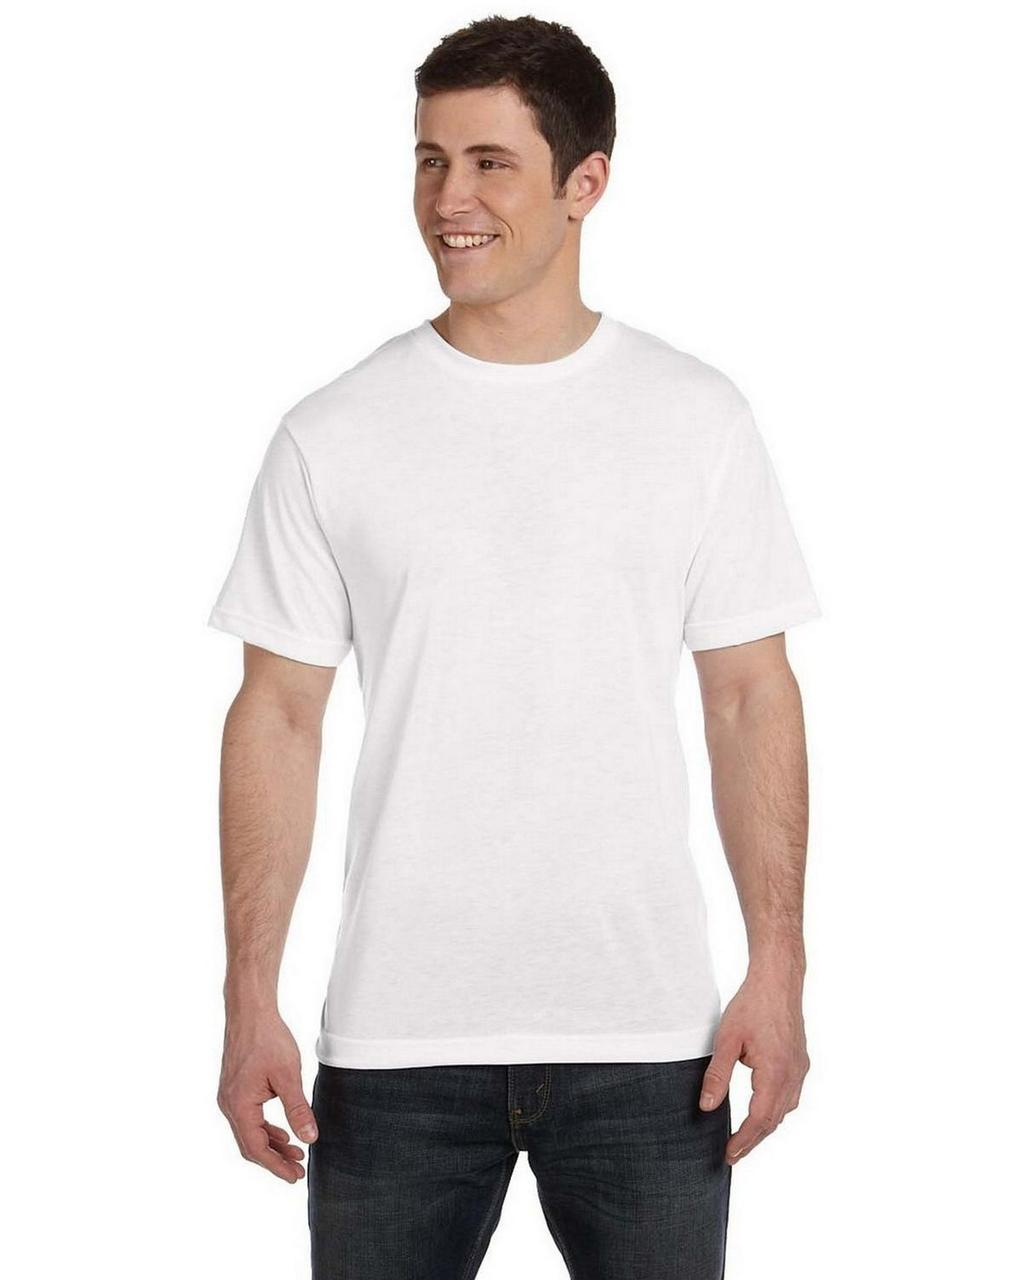 "Футболка ""Джерси 140"" 46 (S) ""Unisex"" цвет: белый"